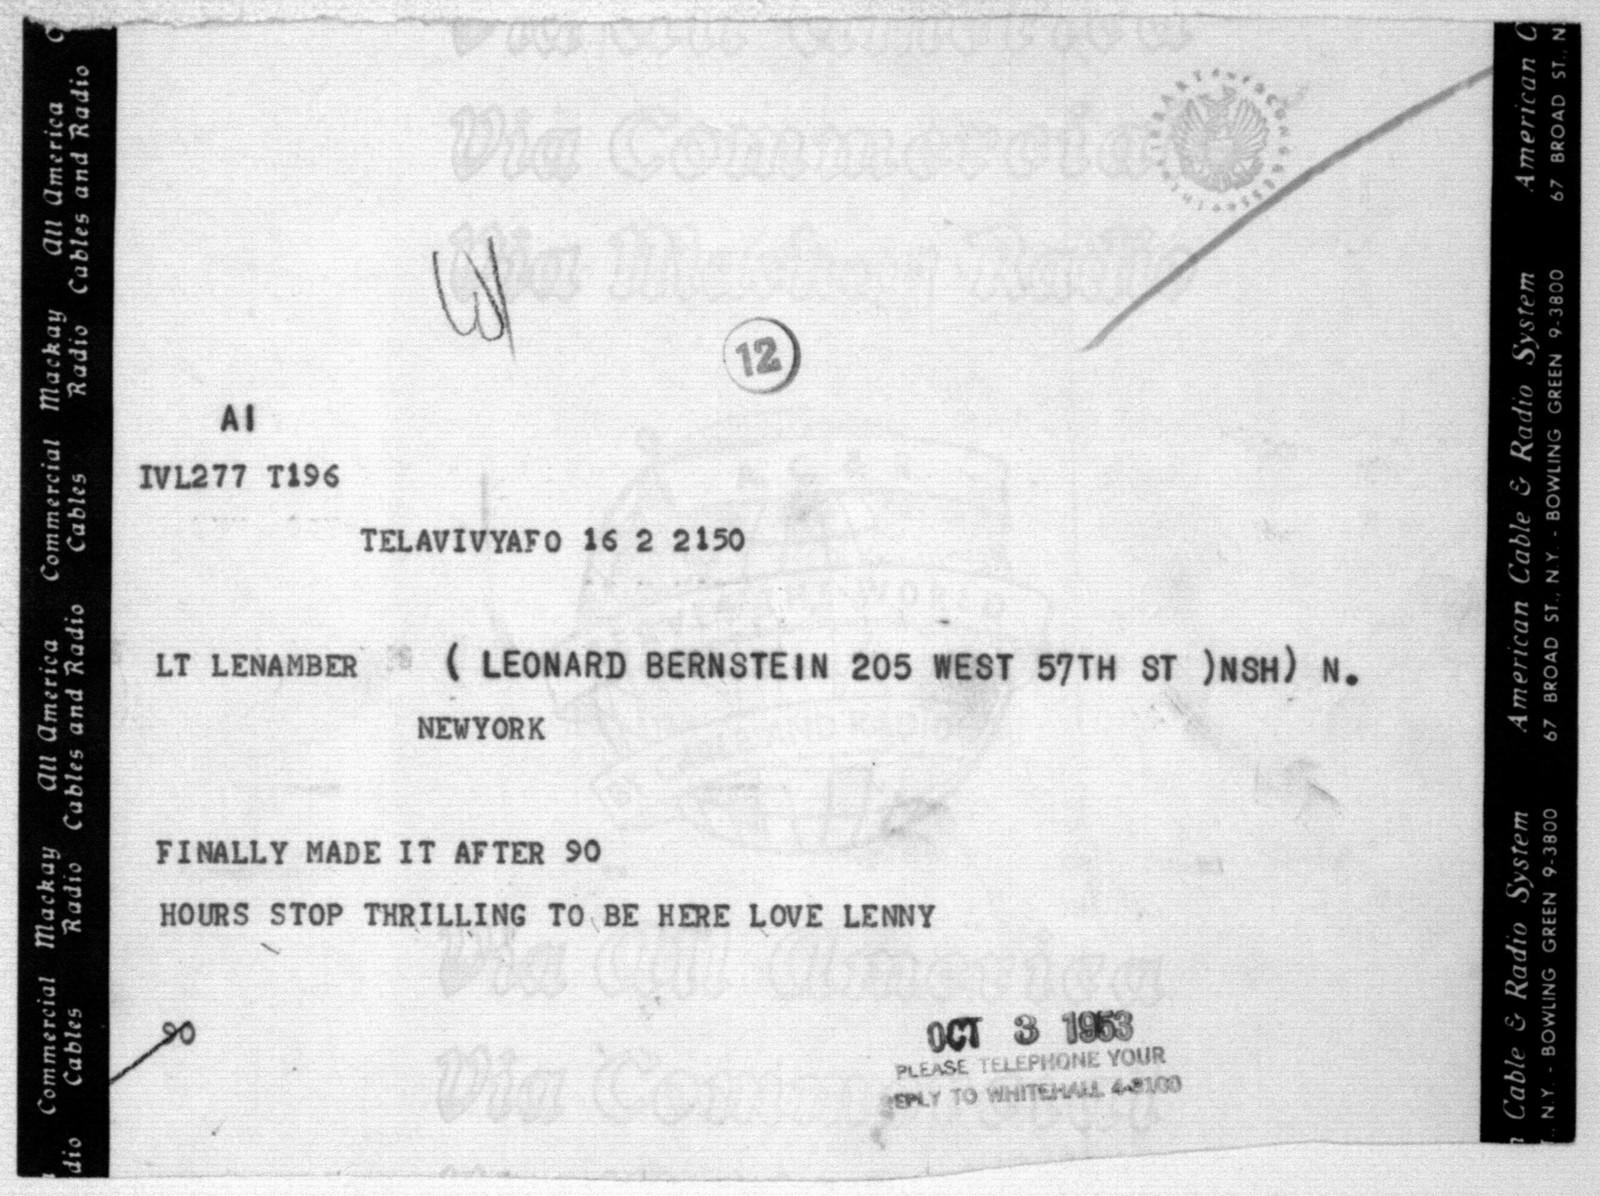 Letter from Leonard Bernstein to Helen Coates, October 3, 1963